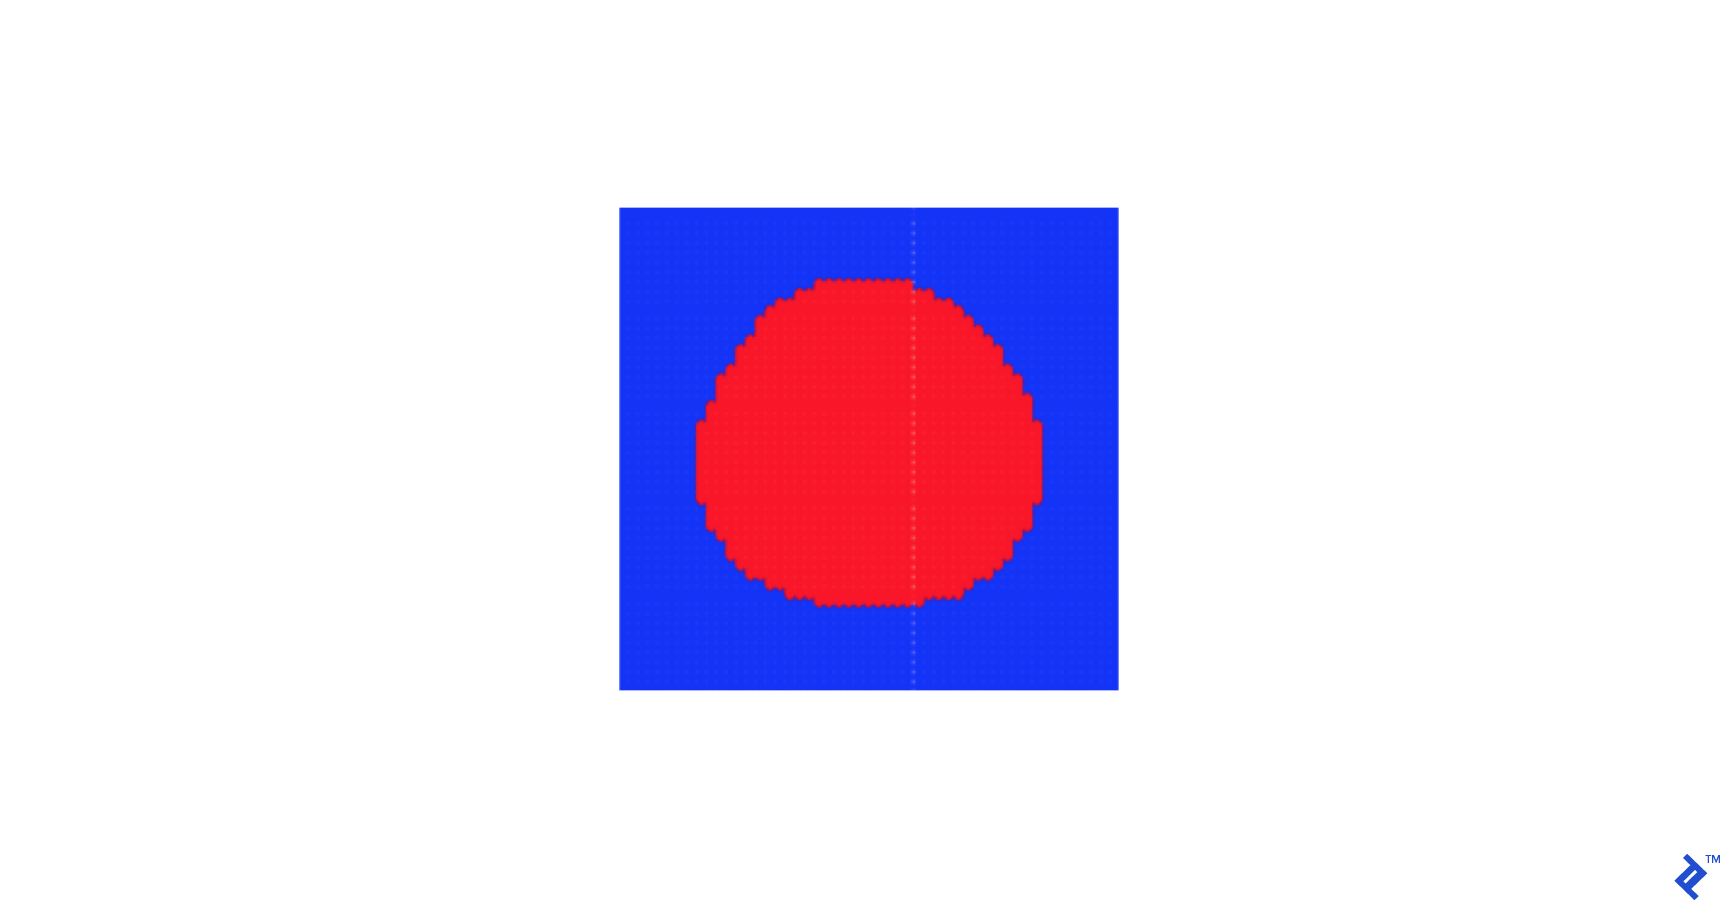 Almost circle